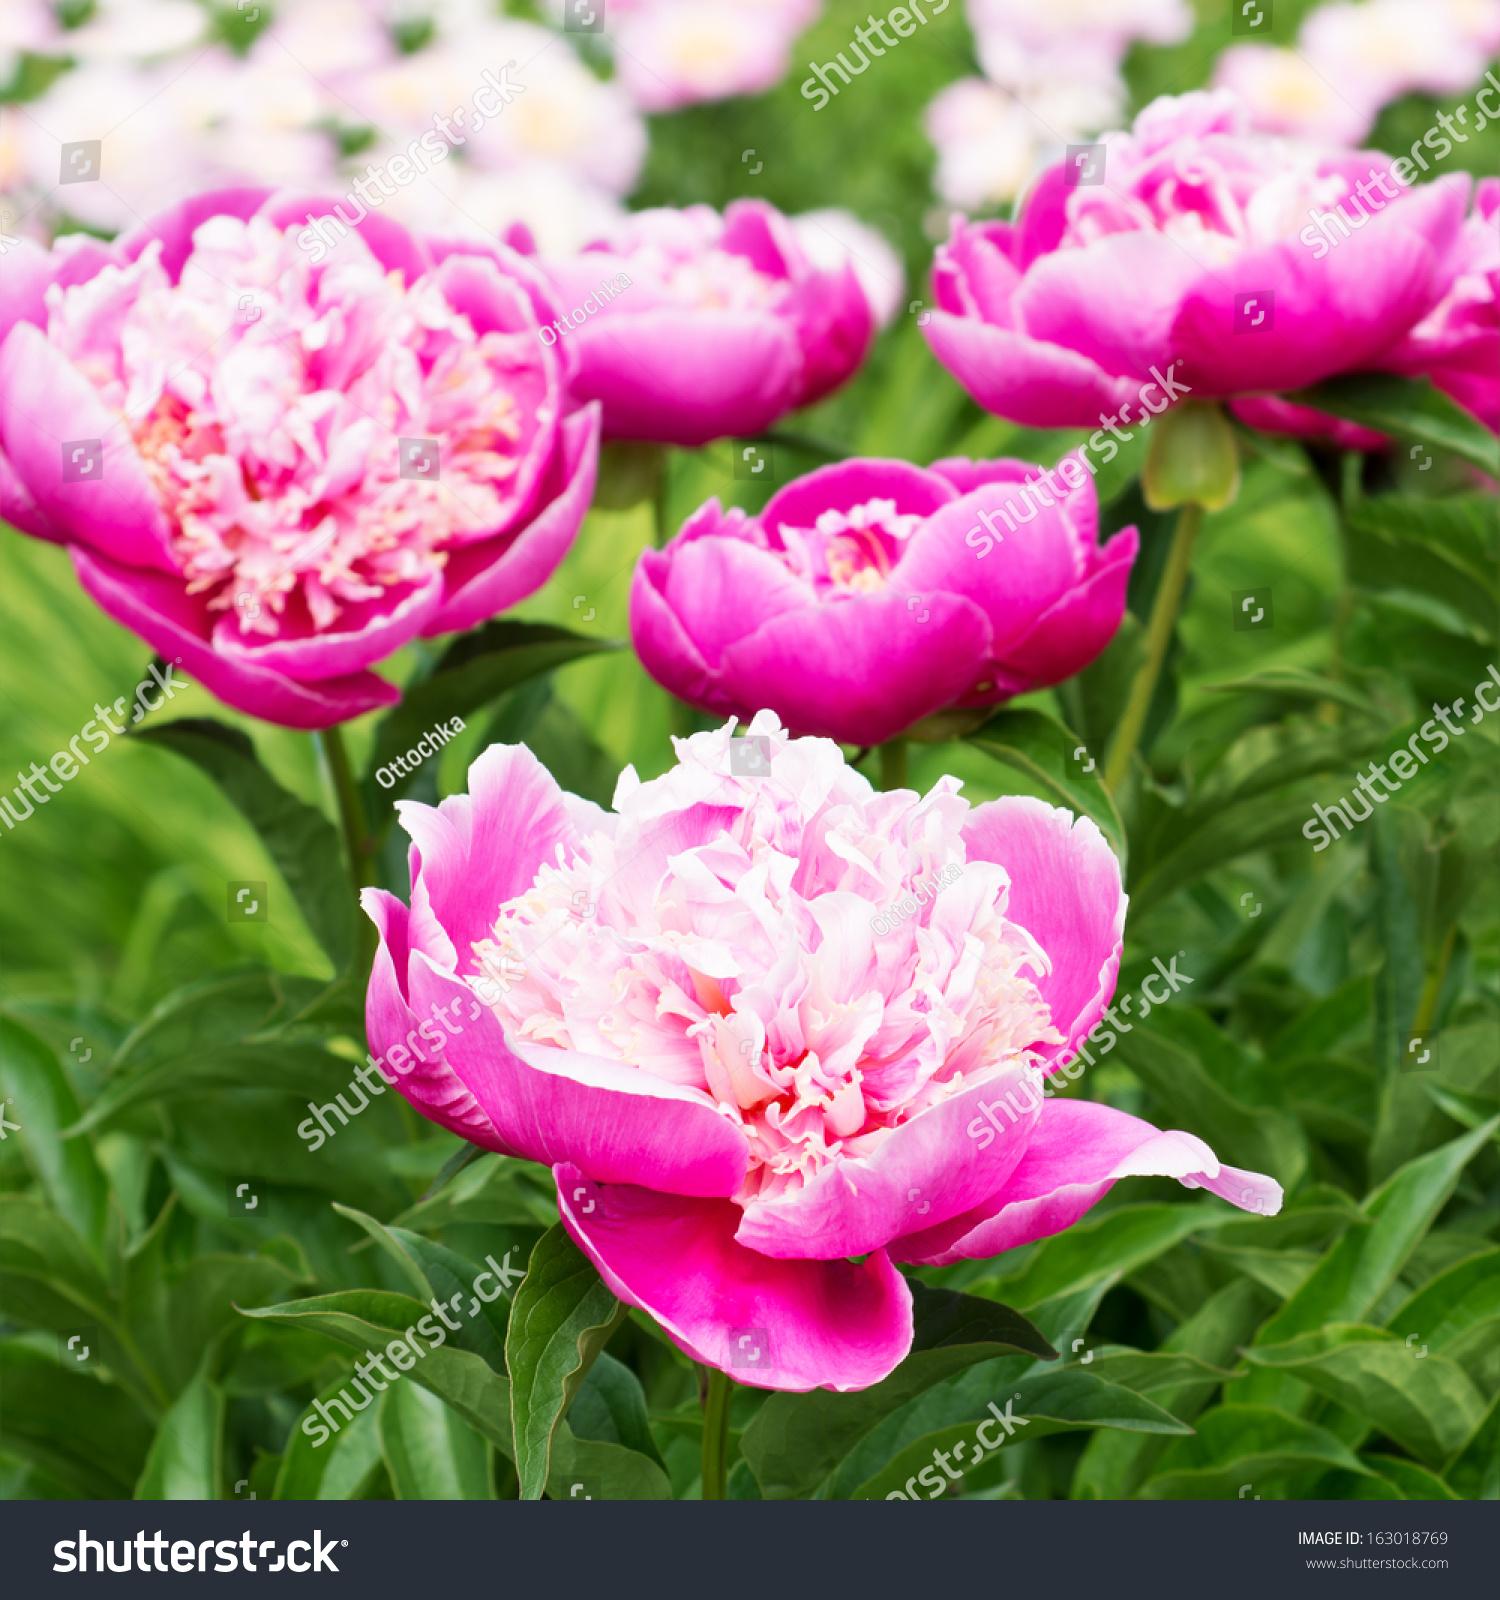 Pink peony flowers garden stock photo 163018769 shutterstock pink peony flowers in the garden dhlflorist Images